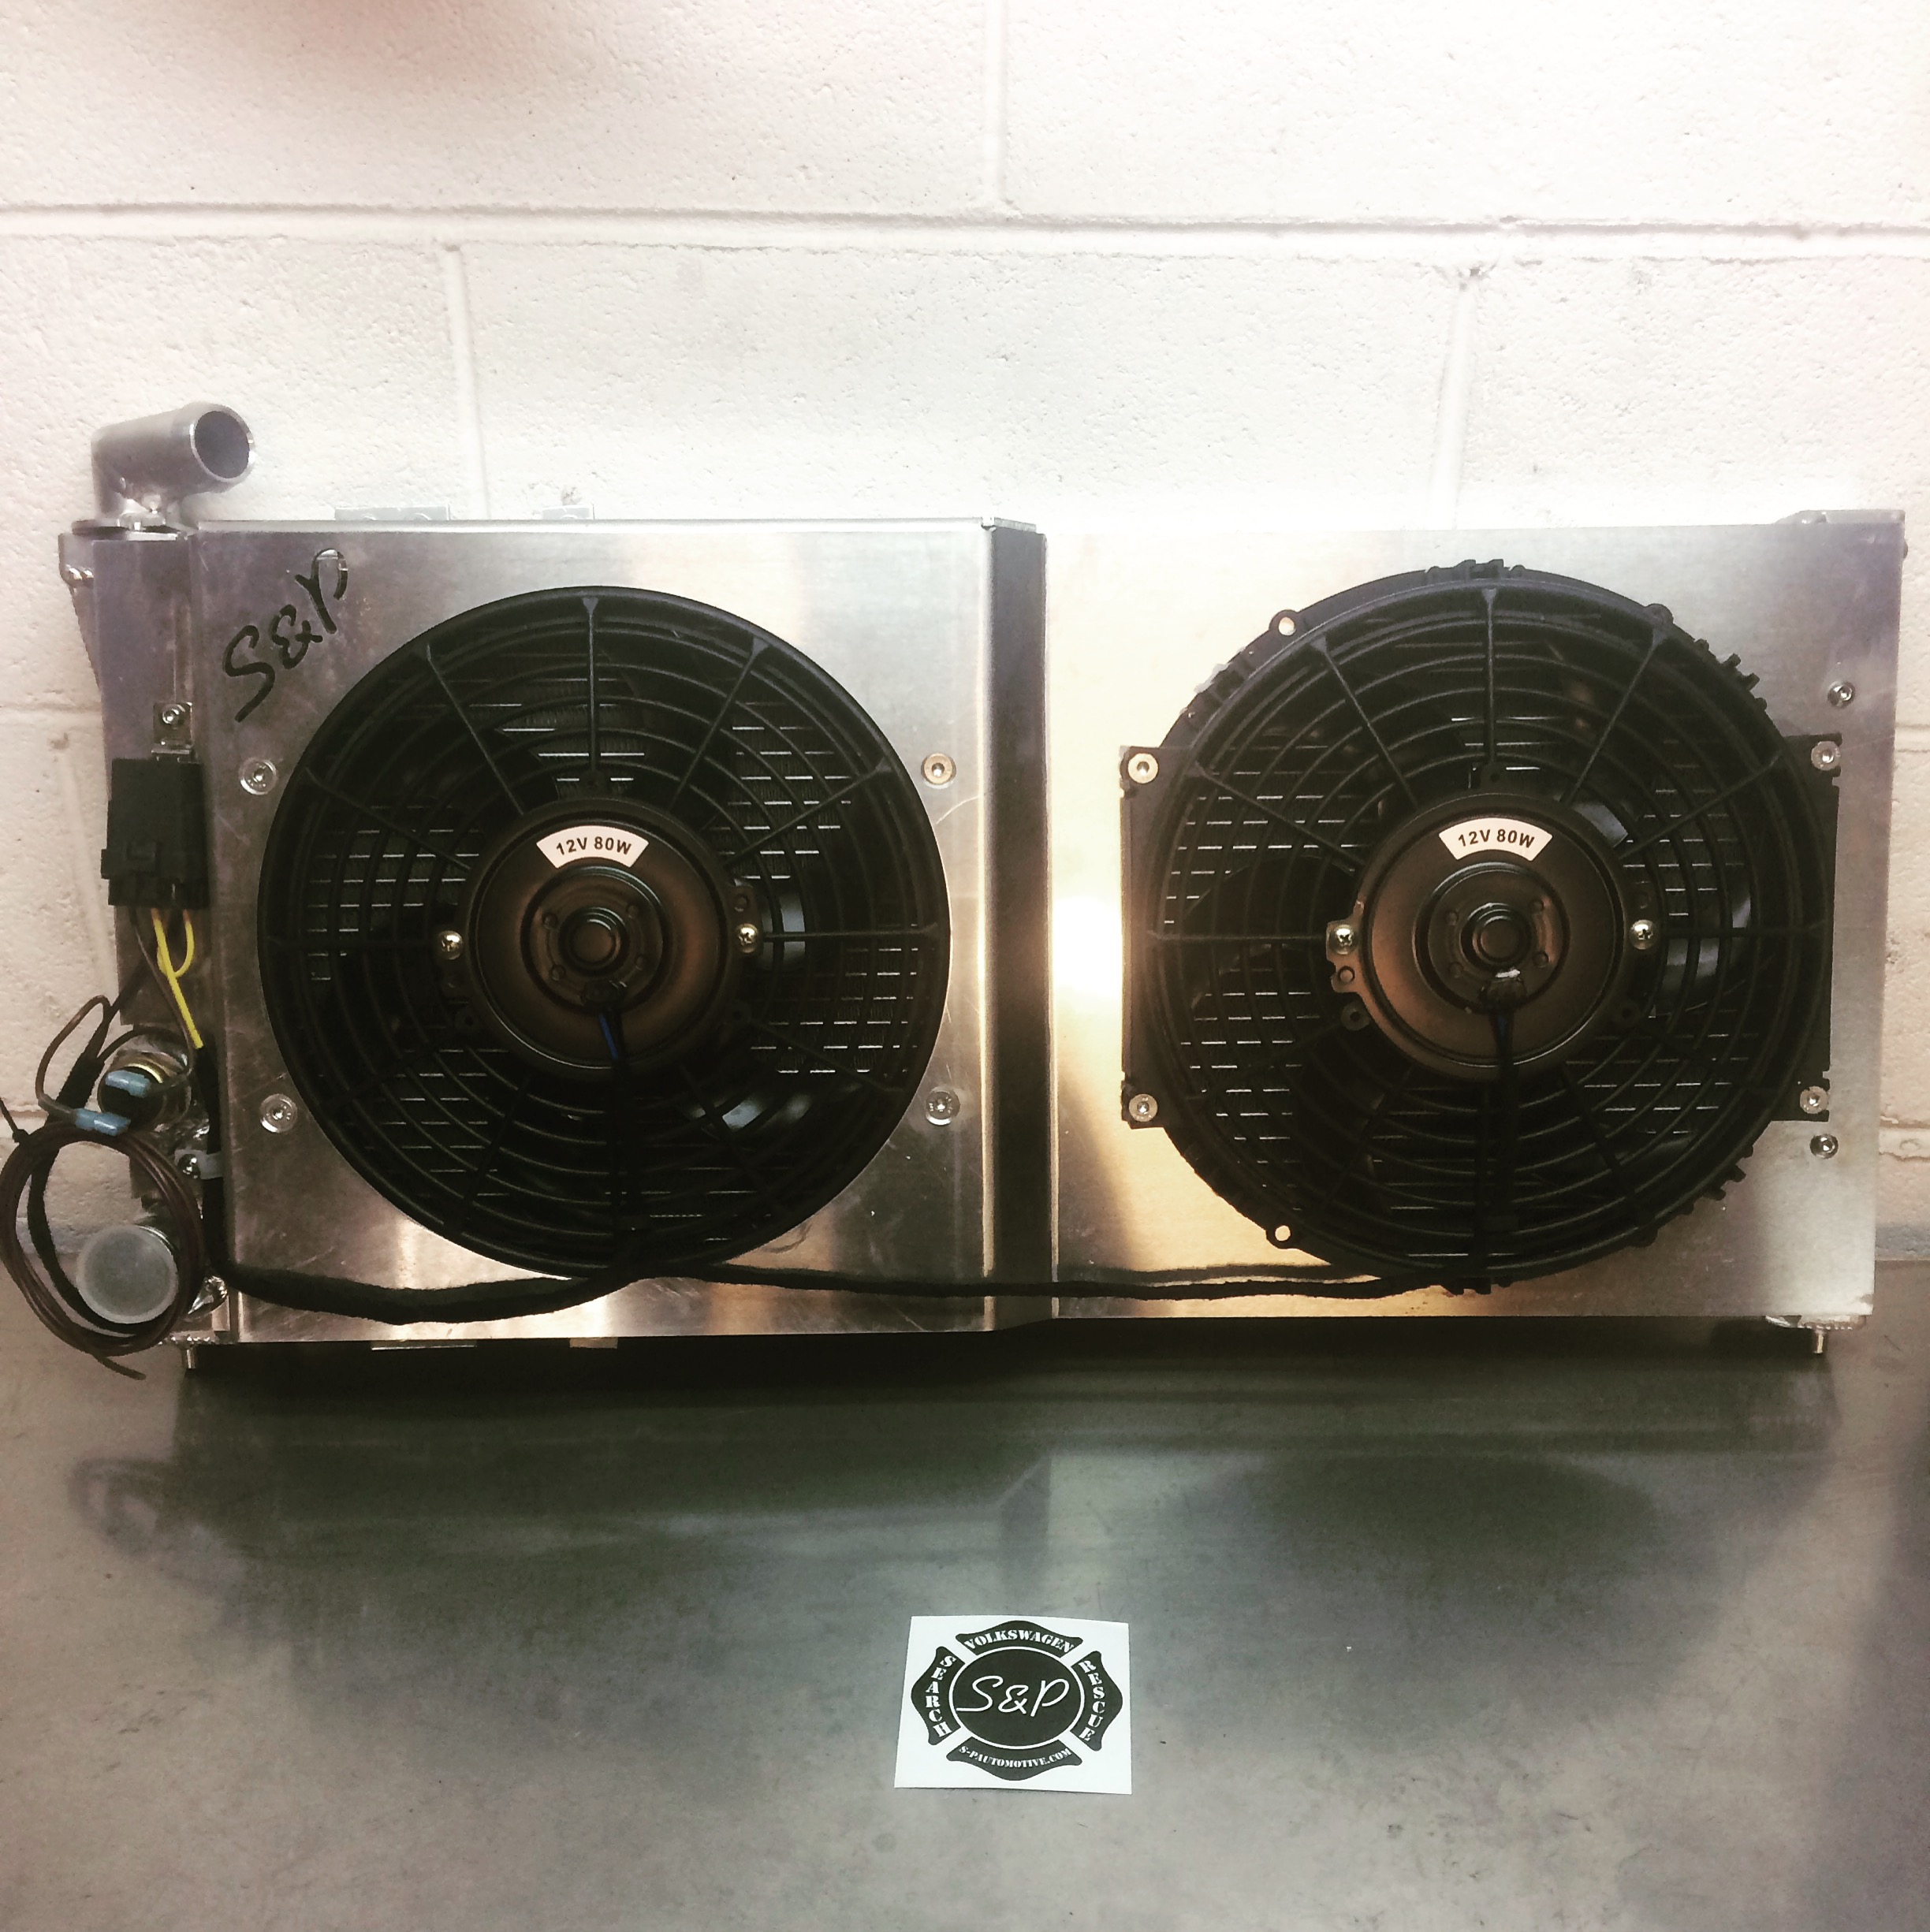 Sp Radiator Options Fan Controls Shrouds Automotive Vw Switch Wiring